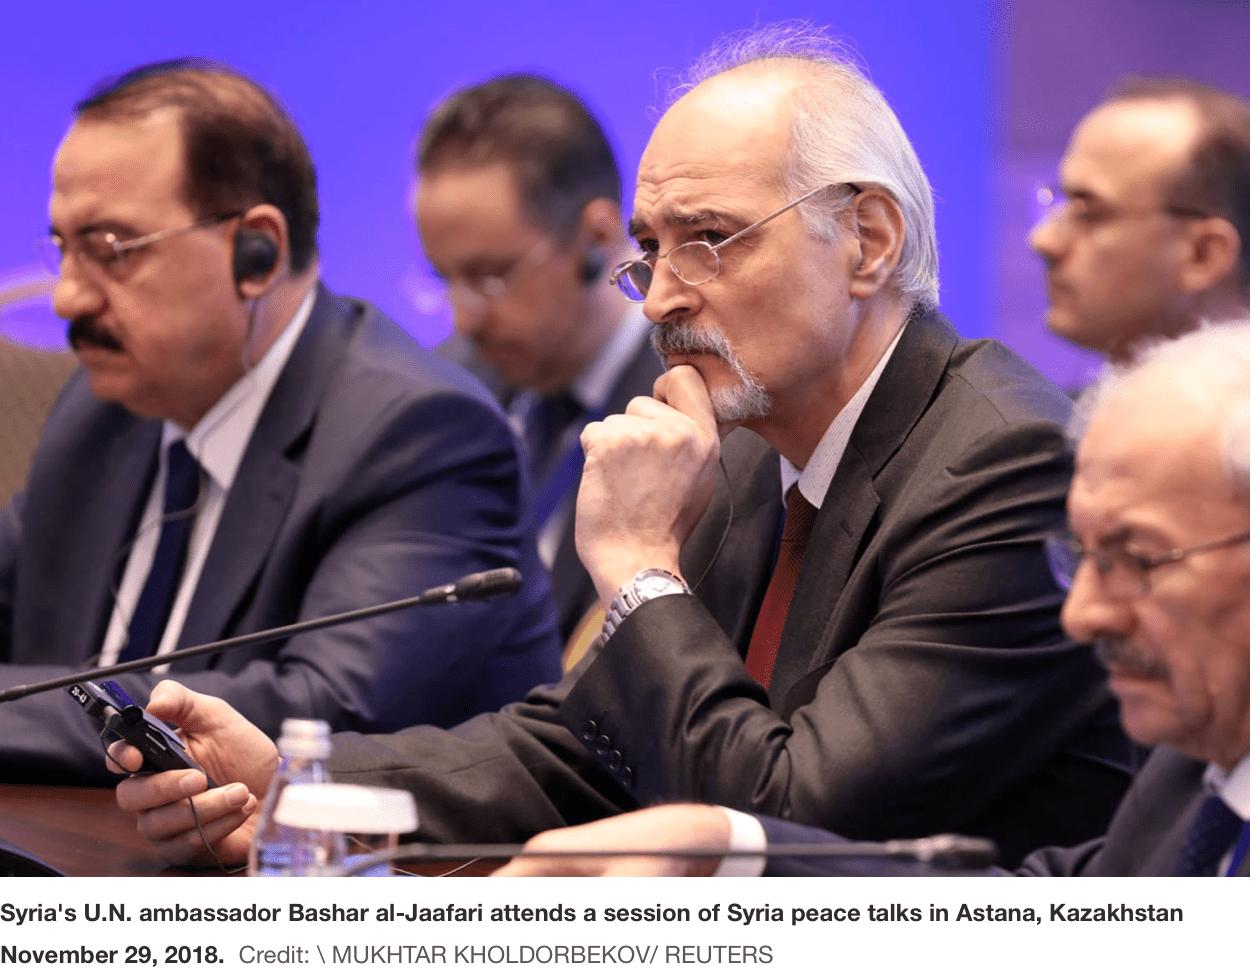 Syria's U.N. ambassador Bashar al-Jaafari attends a session of Syria peace talks in Astana, Kazakhstan, November 29, 2018. Credit: Mukhtar Kholdorbekov / Reuters